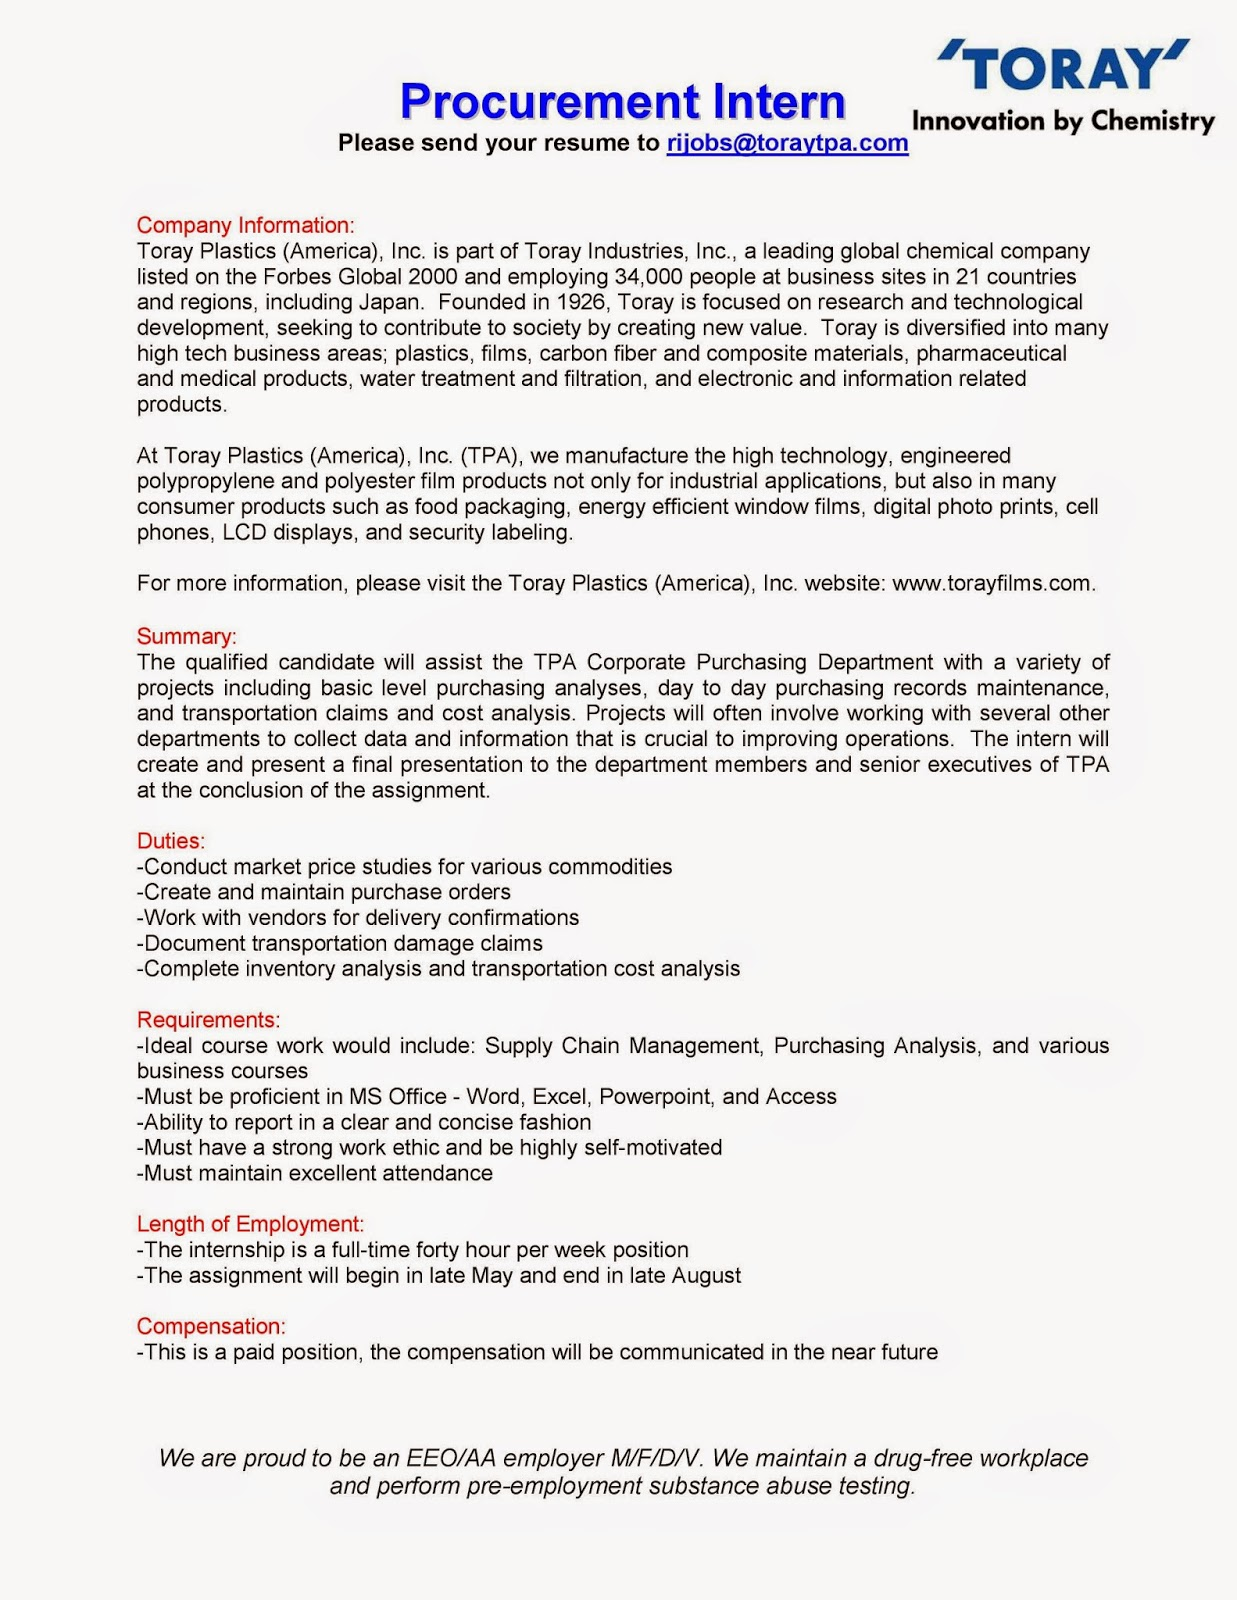 URI CBA Internship/Job Information: Toray Plastics